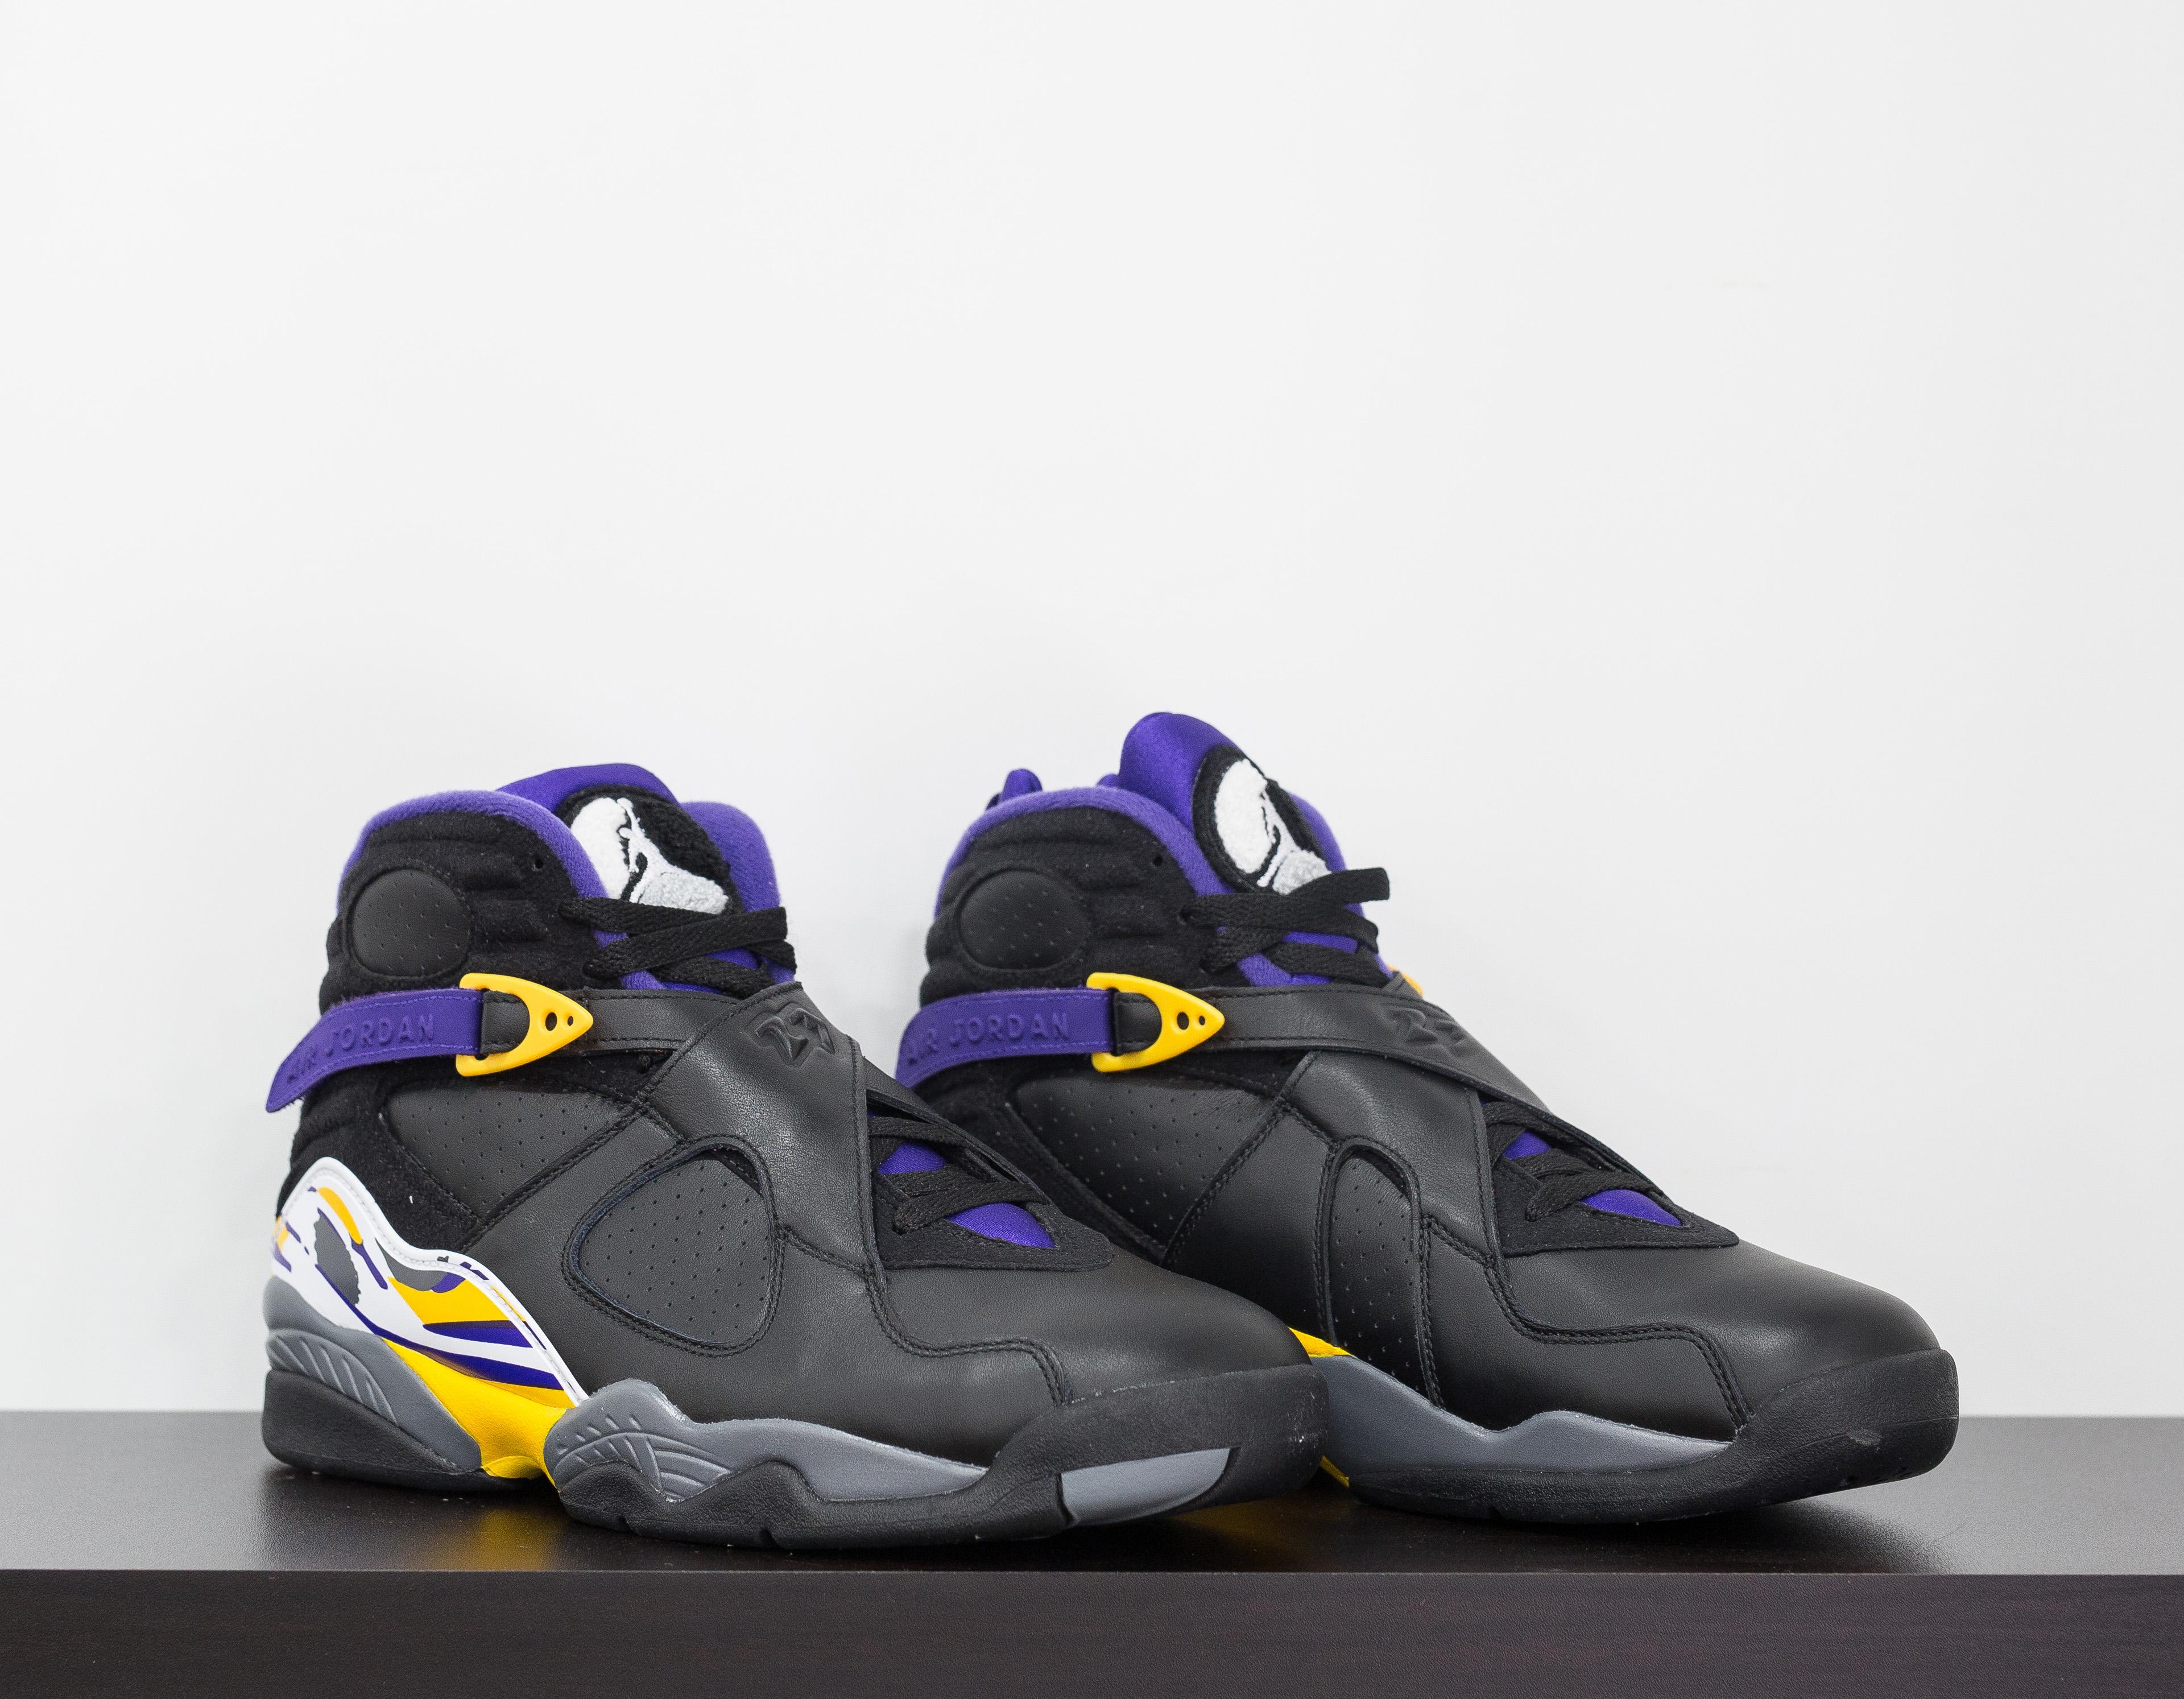 kobe bryant 2 shoes nike cross shoes